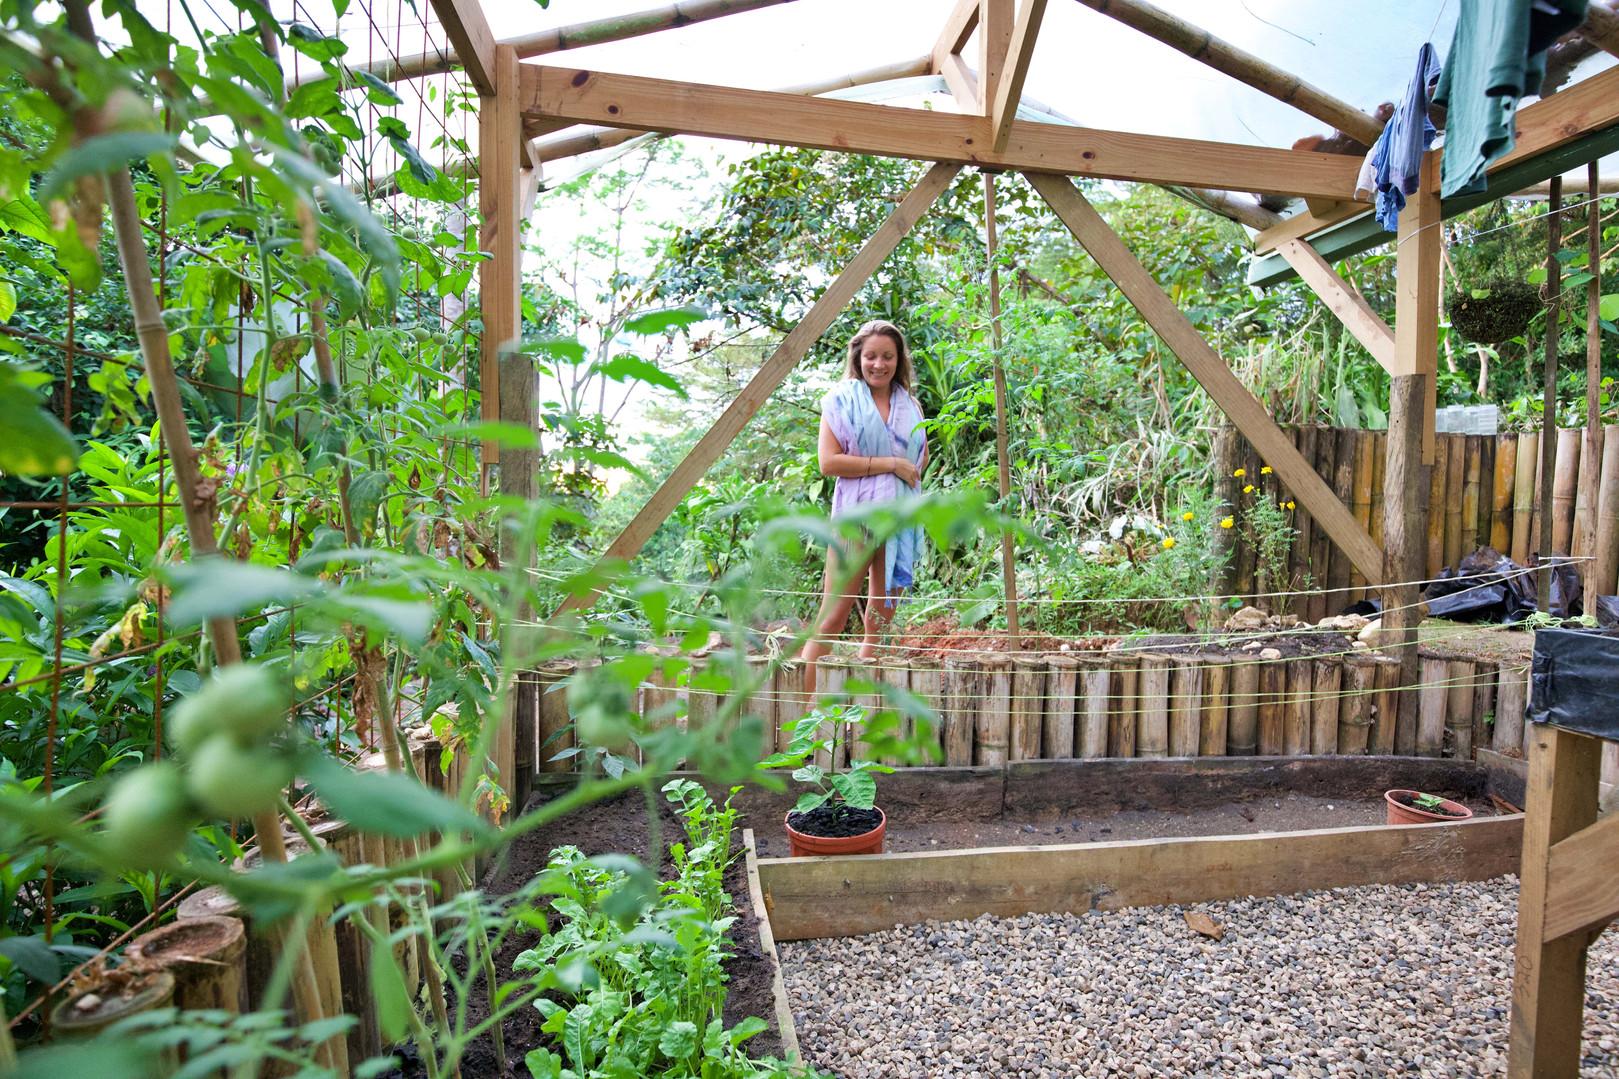 Garden-min.jpg